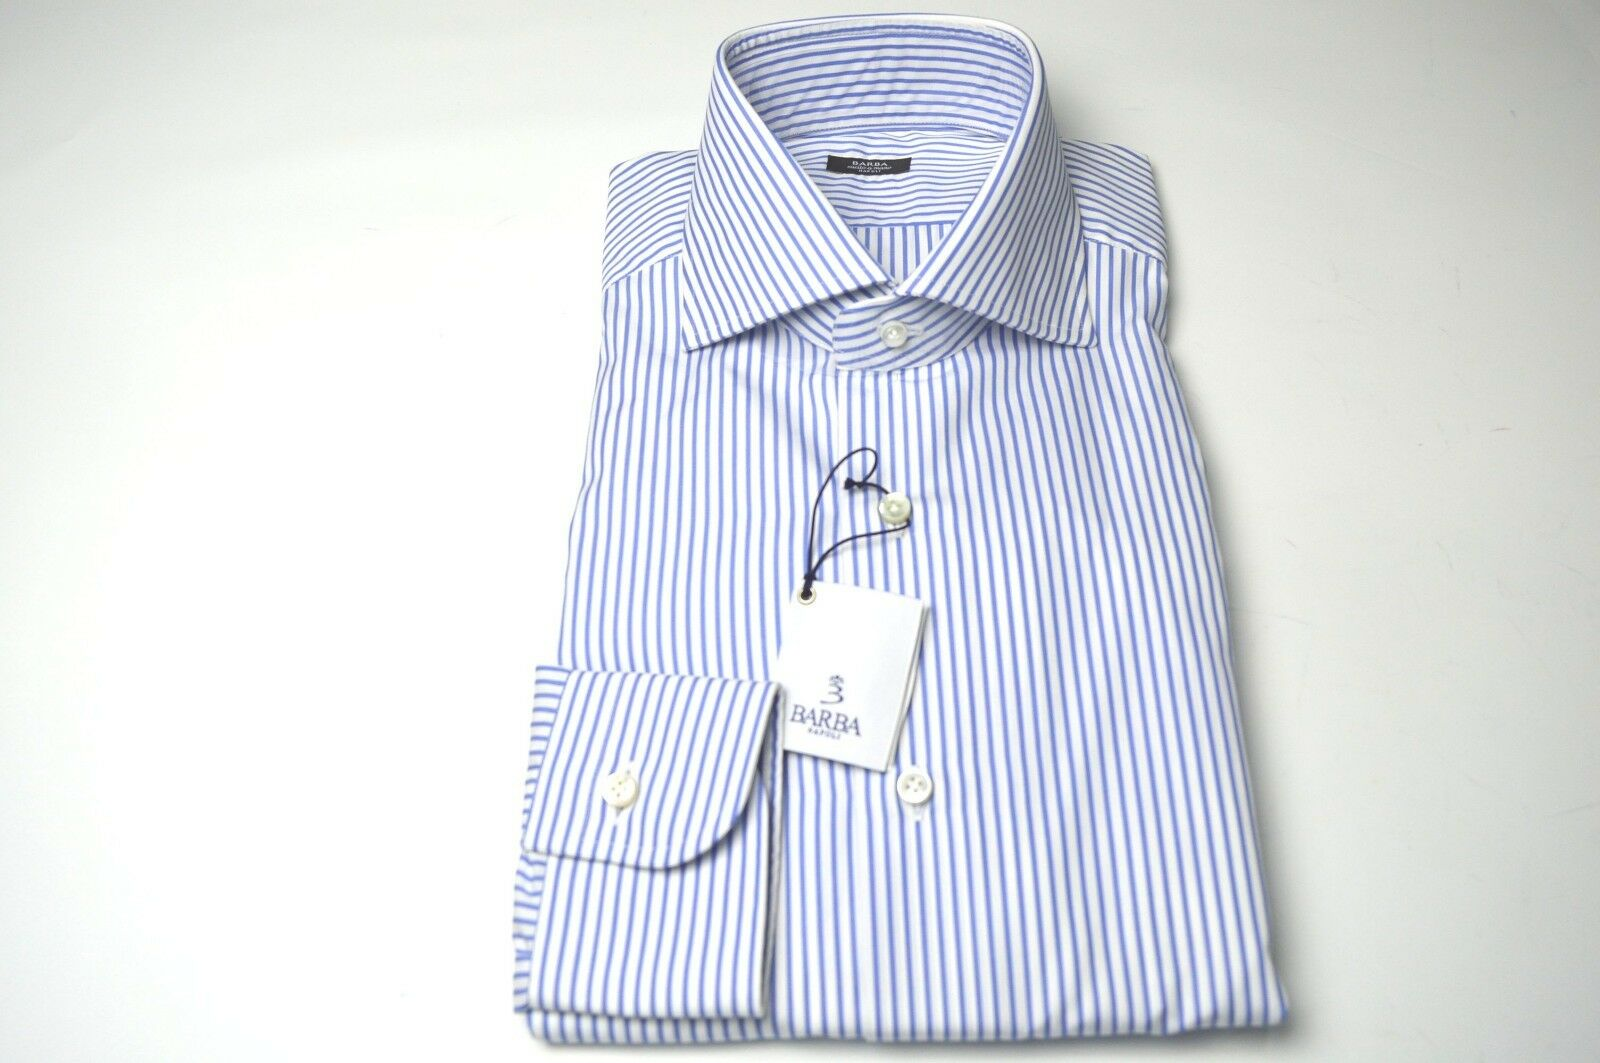 NEW BARBA  Dress SHIRT  100% Cotton Size 16.5  Us 42 Eu  (BA13)